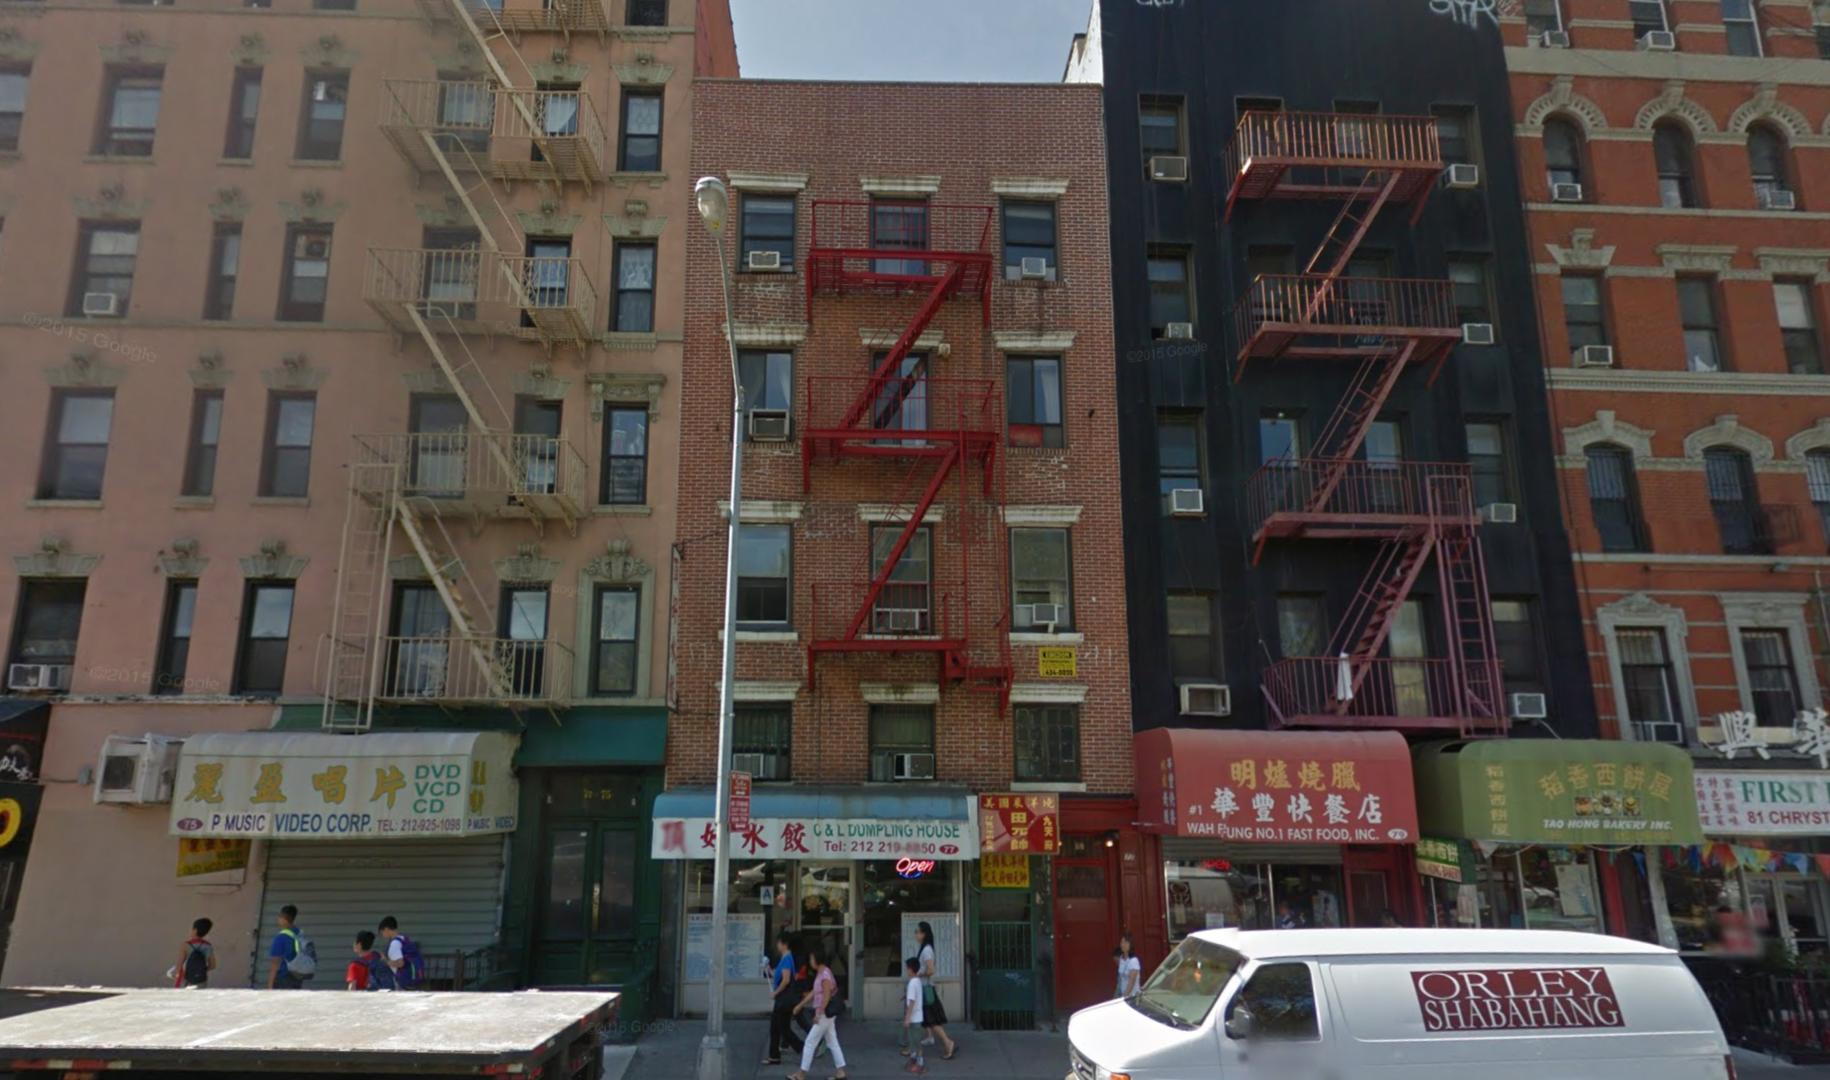 77 Chrystie Street, image via Google Maps